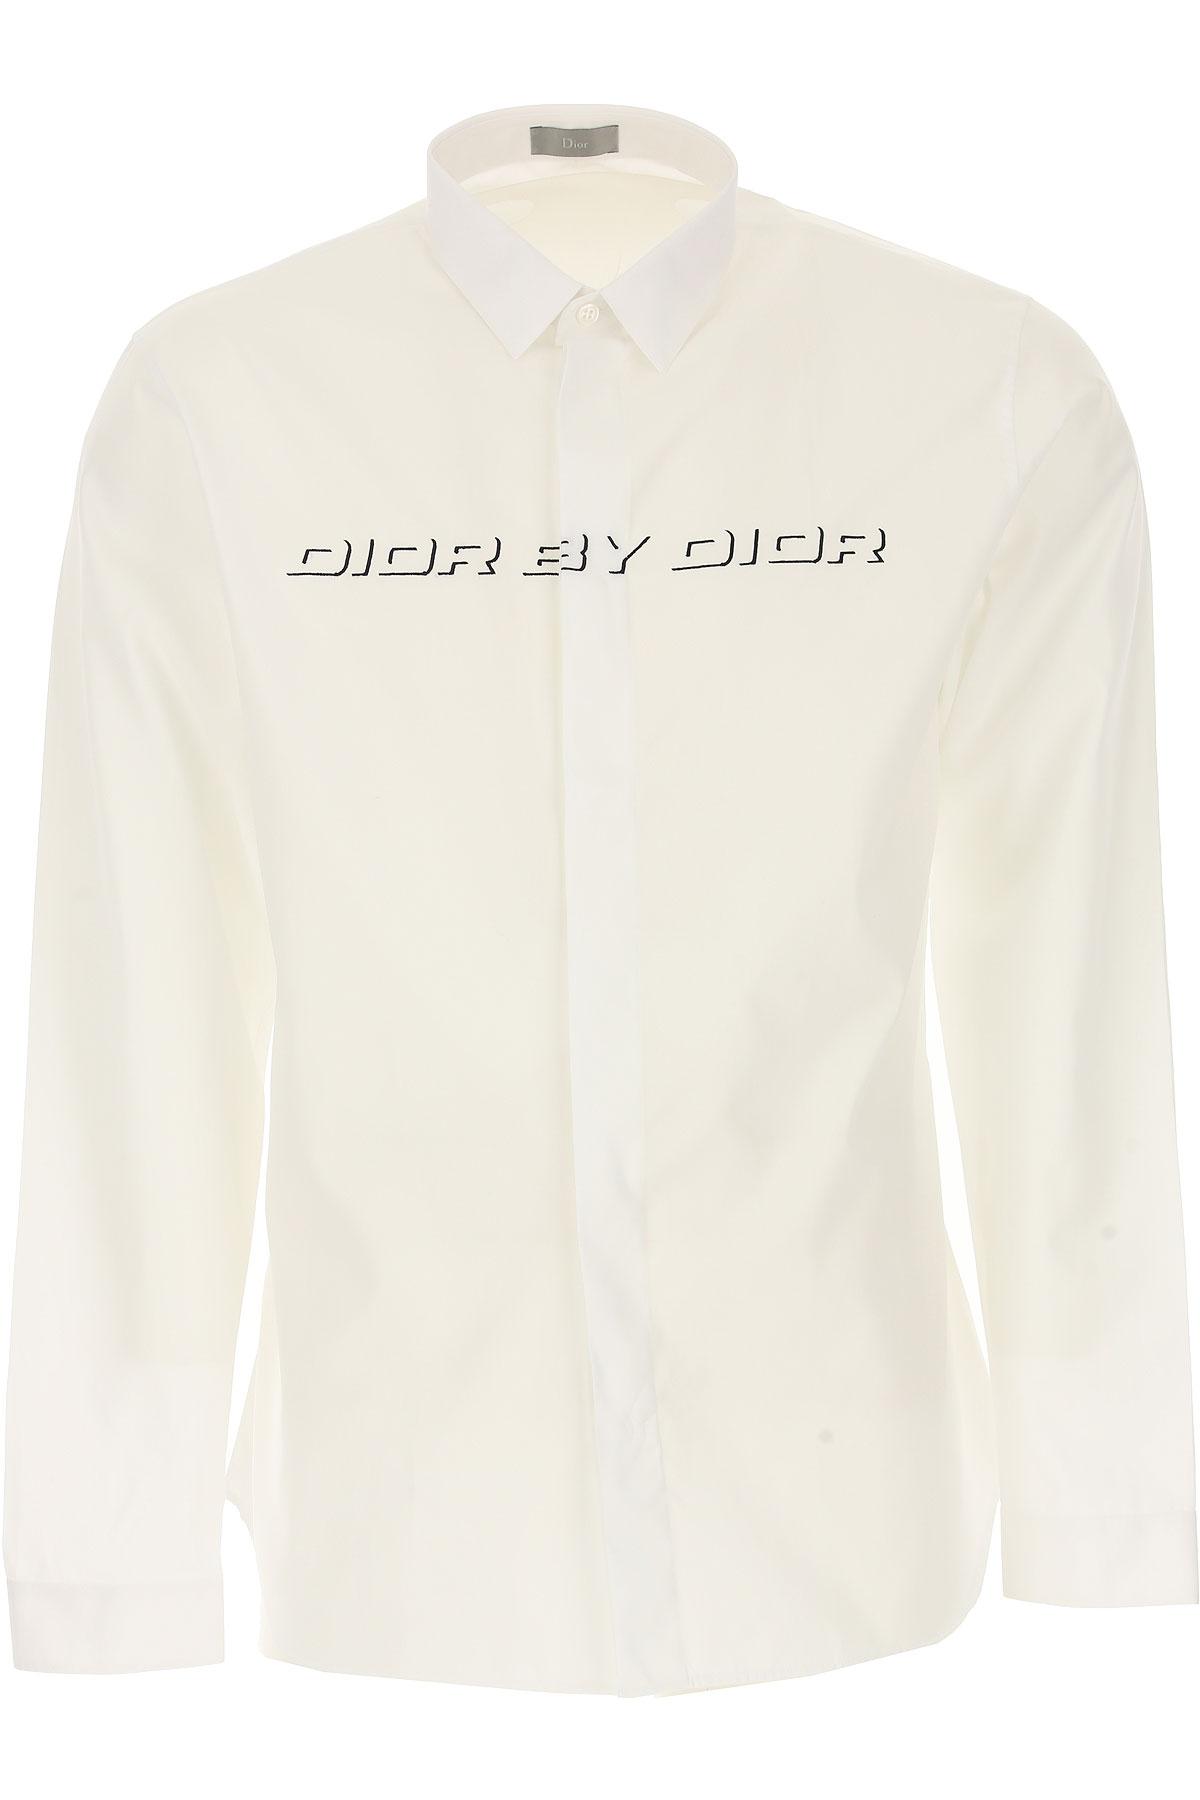 Christian Dior Chemise Homme, Blanc, Coton, 2017, 39 40 41